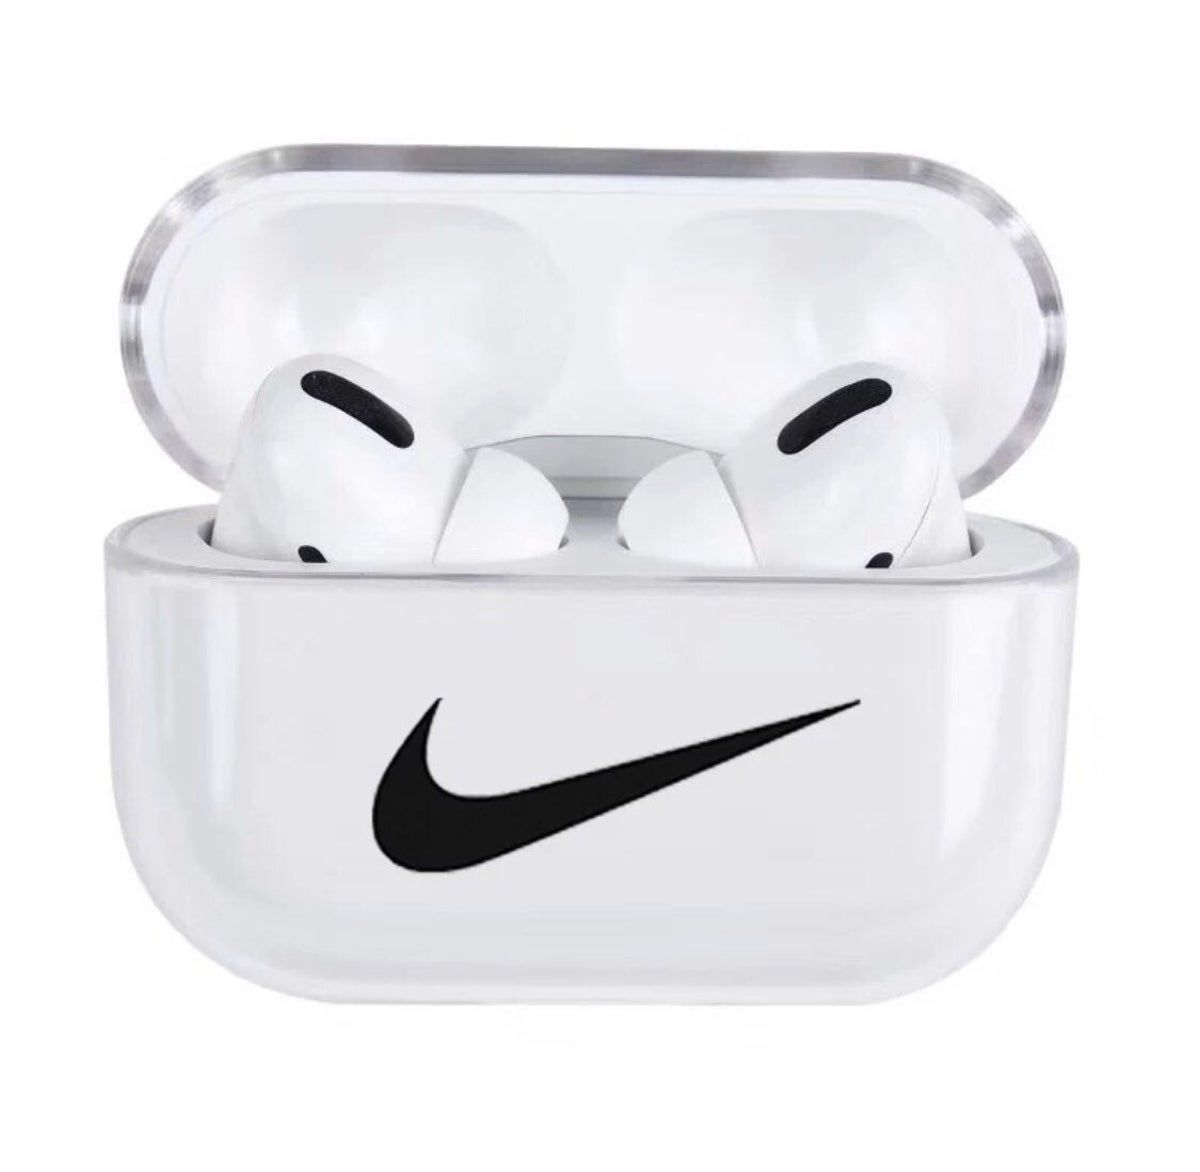 Airpod Pro Case Nike Logo Airpod Pro Case Airpods Pro